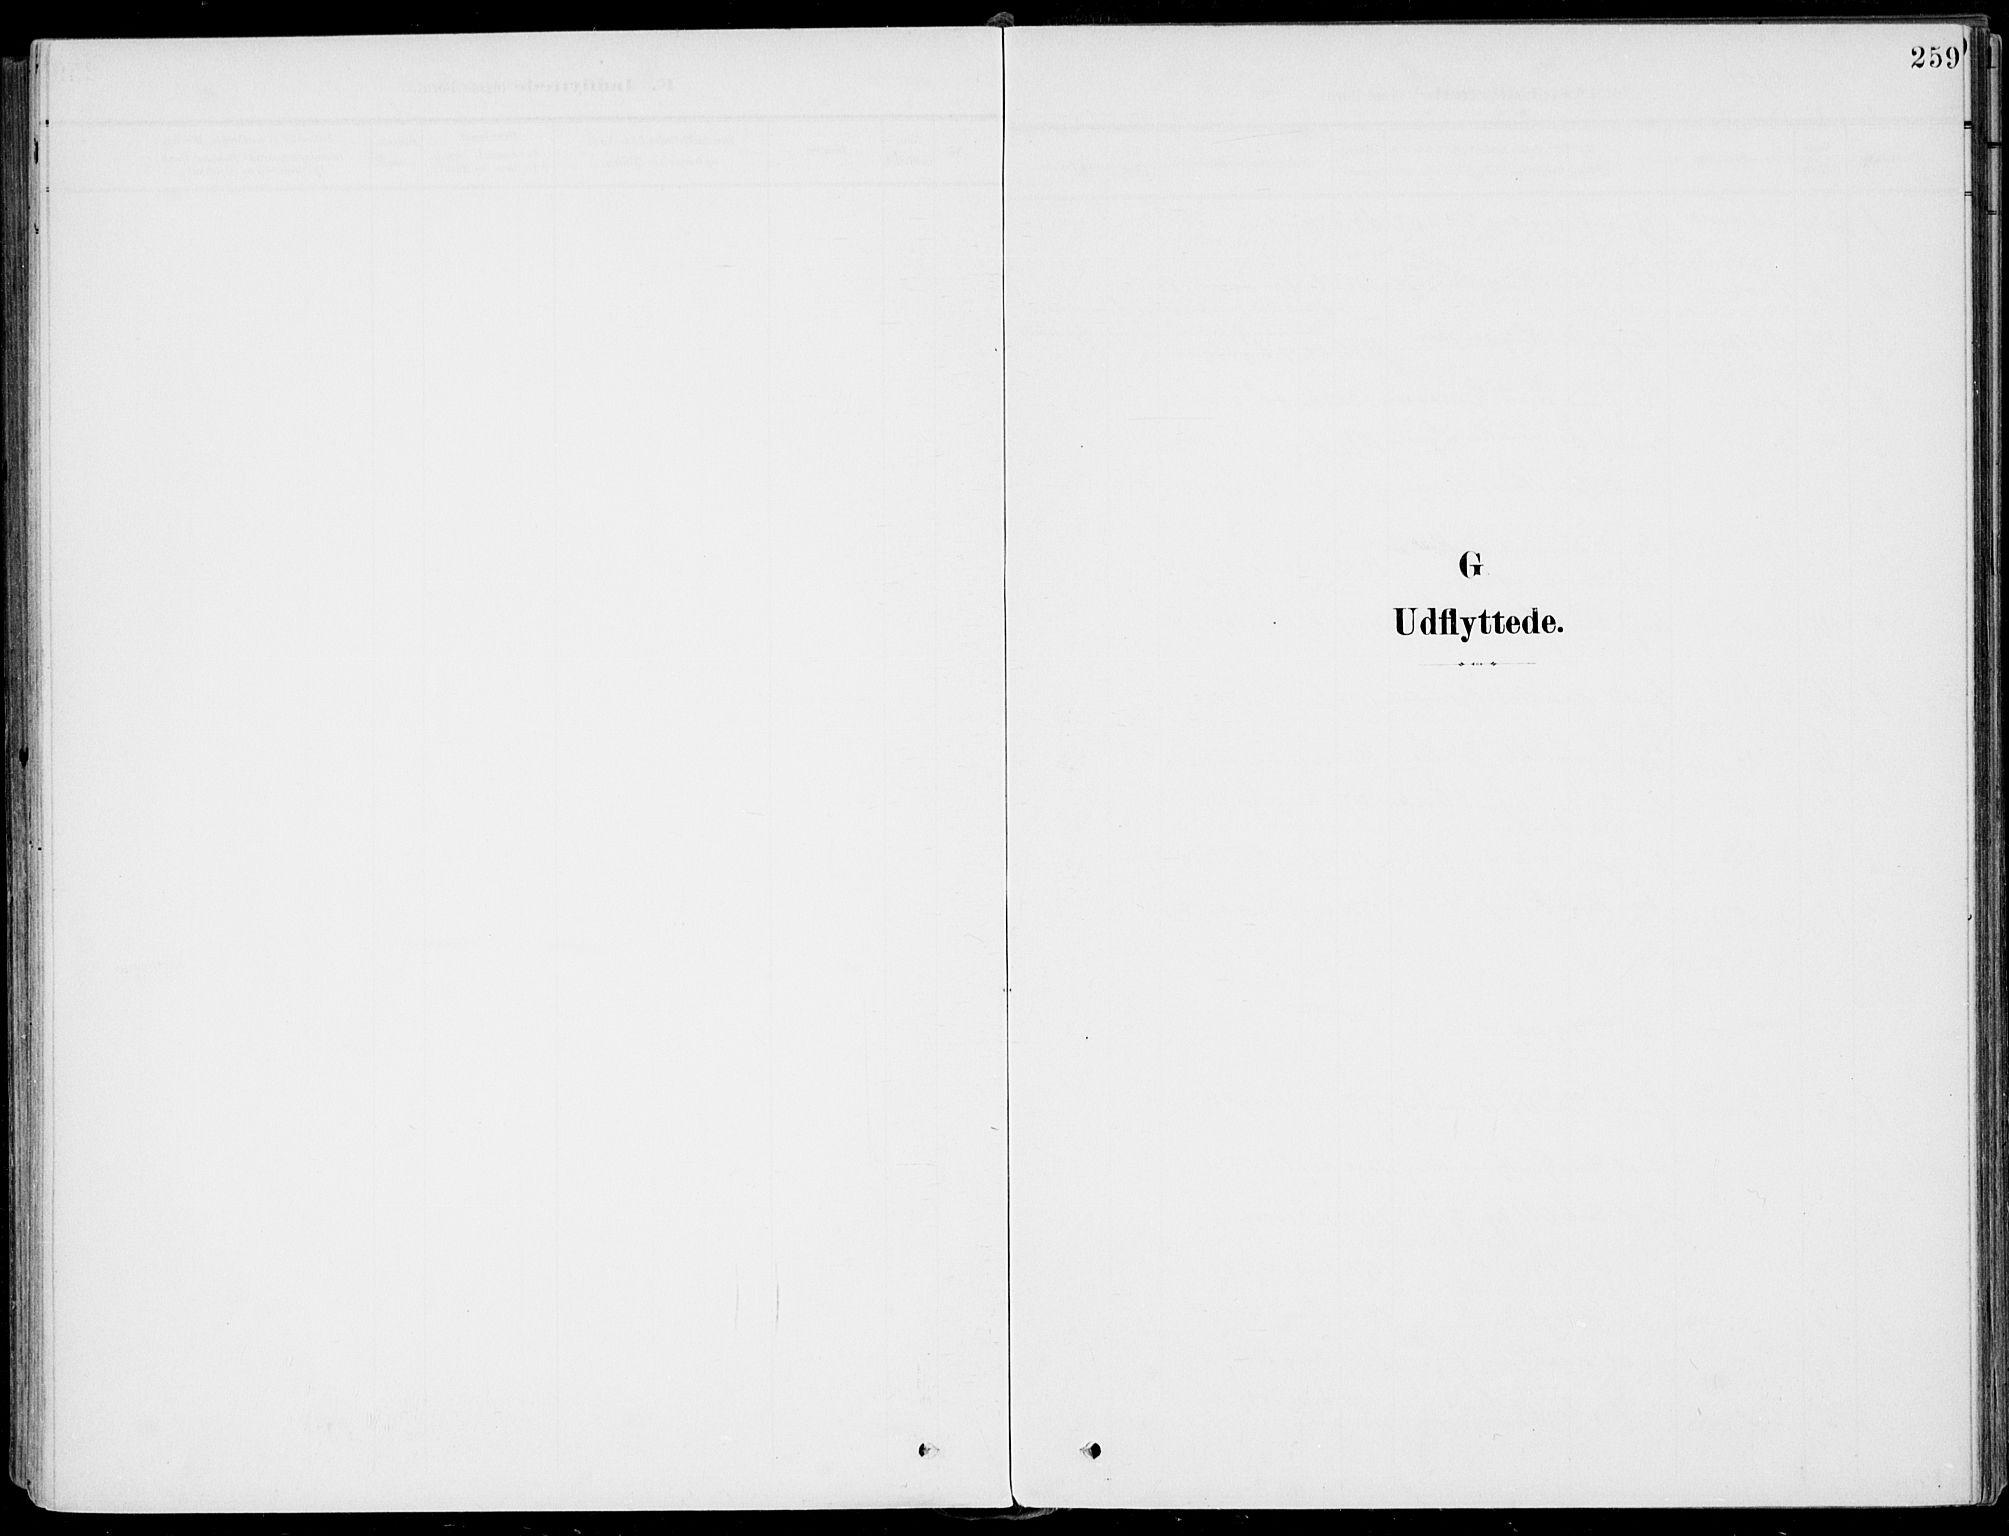 SAKO, Sigdal kirkebøker, F/Fb/L0002: Parish register (official) no. II 2, 1901-1914, p. 259